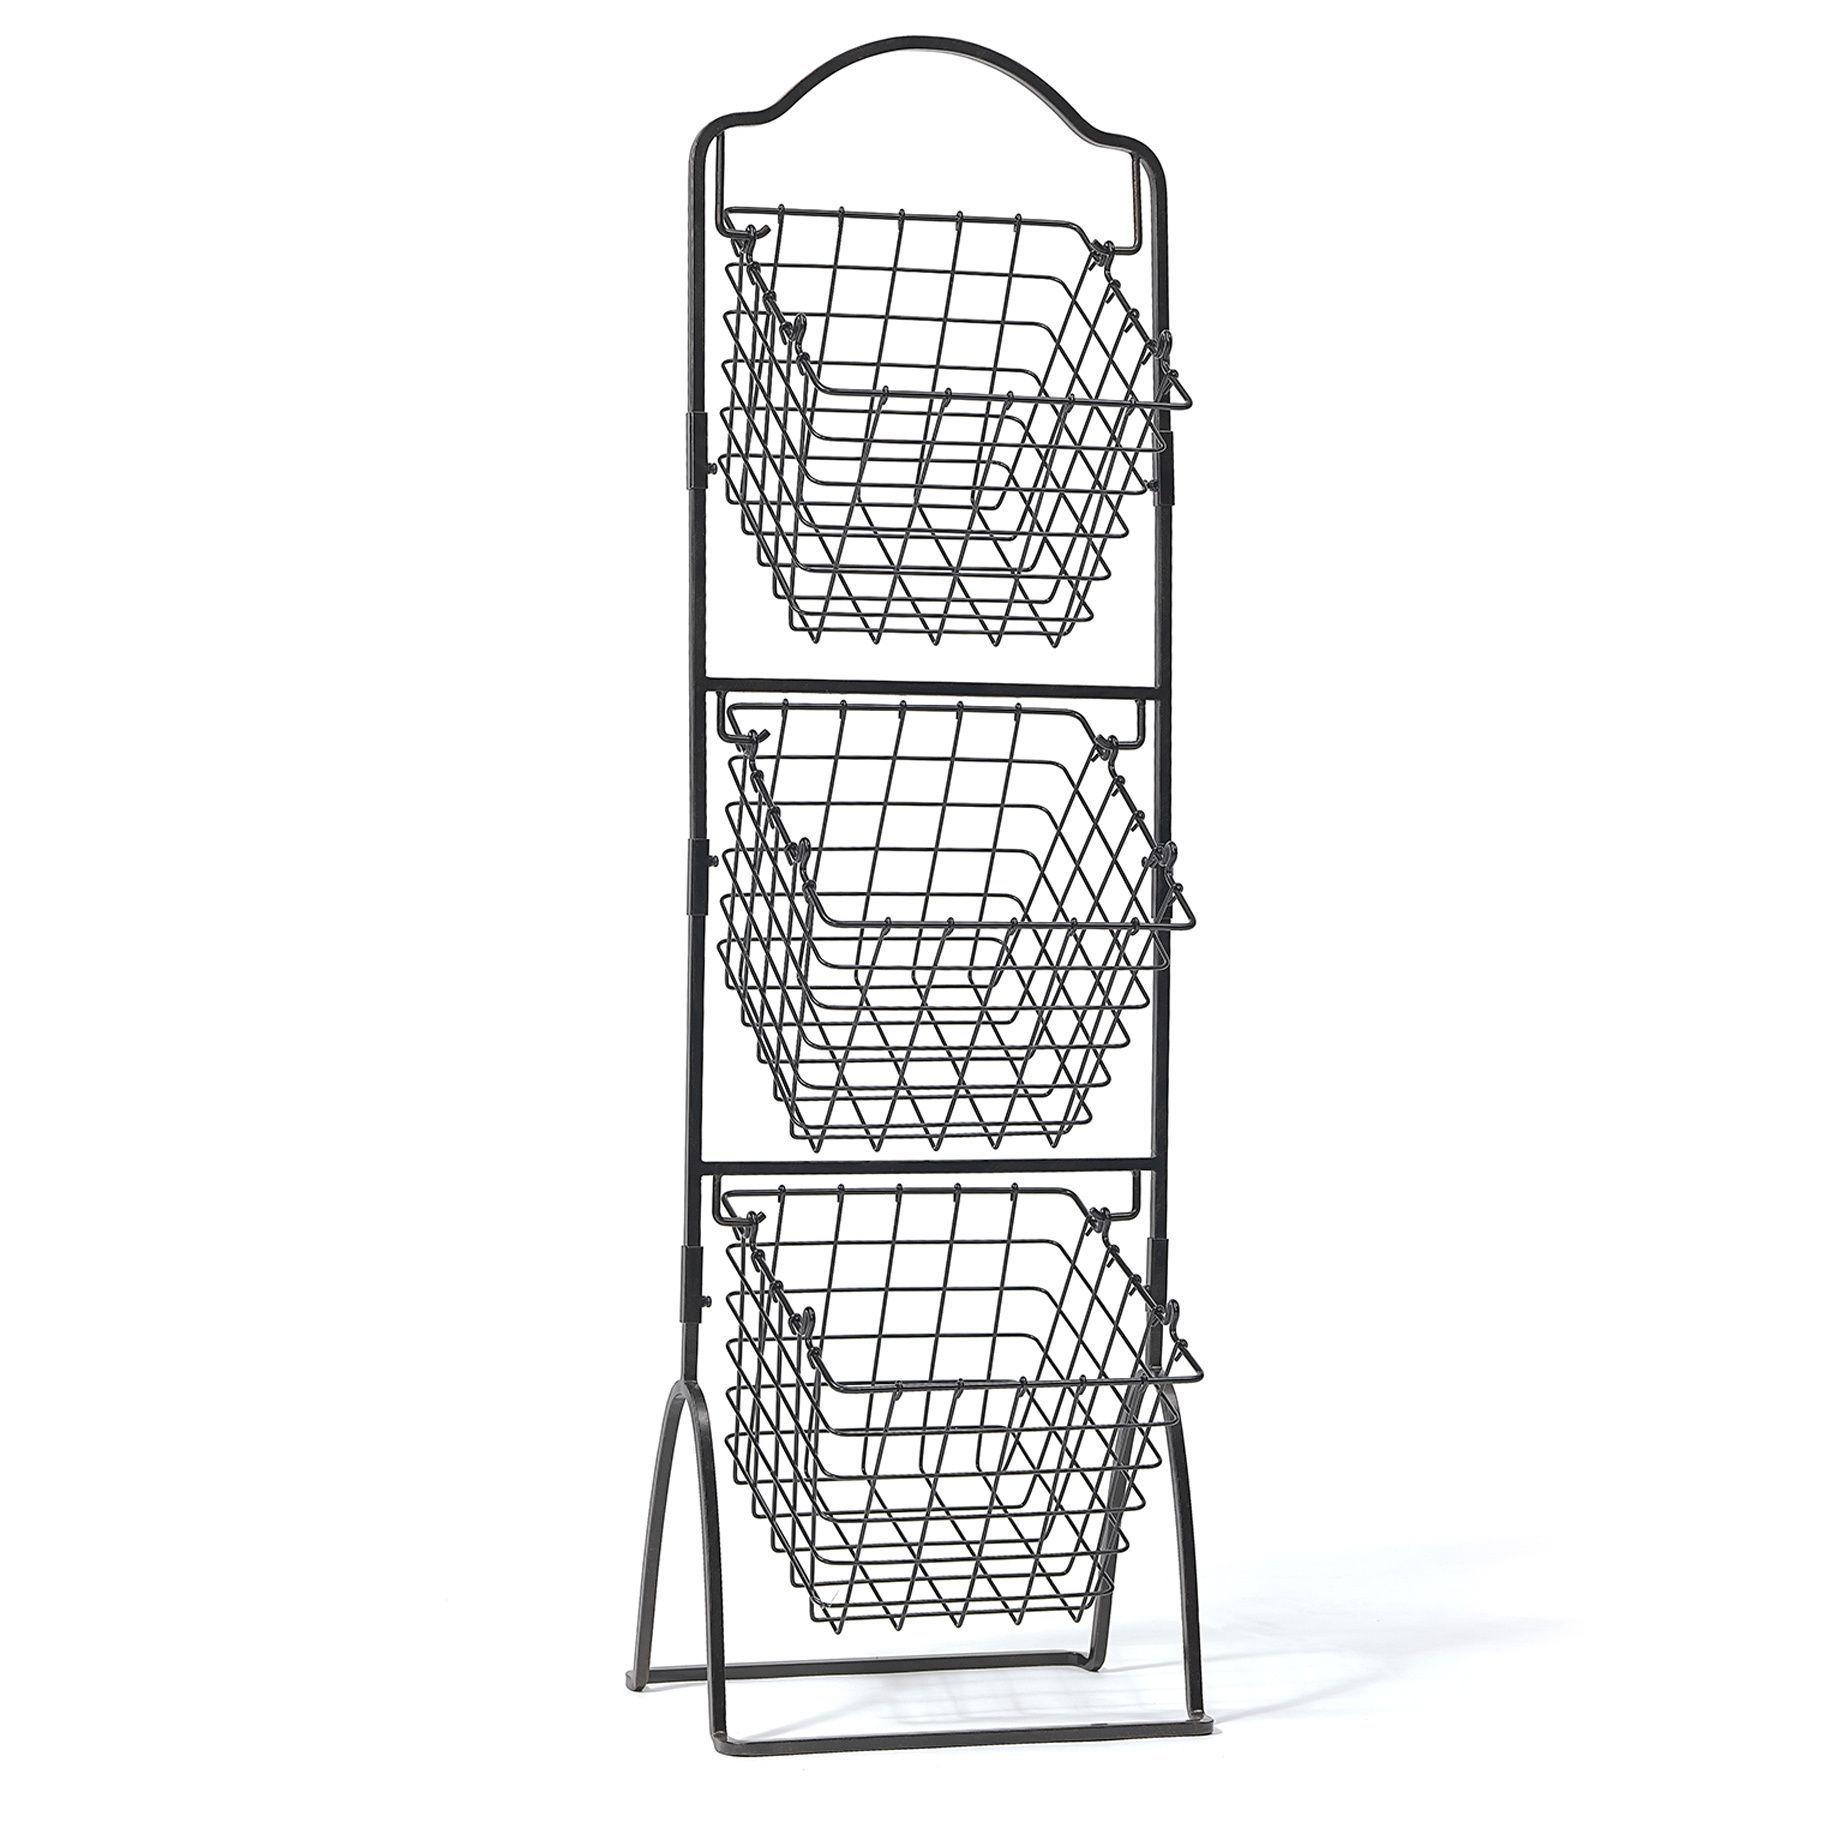 Gourmet Basic 3 Tier Wire Market Basket (Gourmet Basic 3 Tier Wire Market  Basket), Black (Metal)